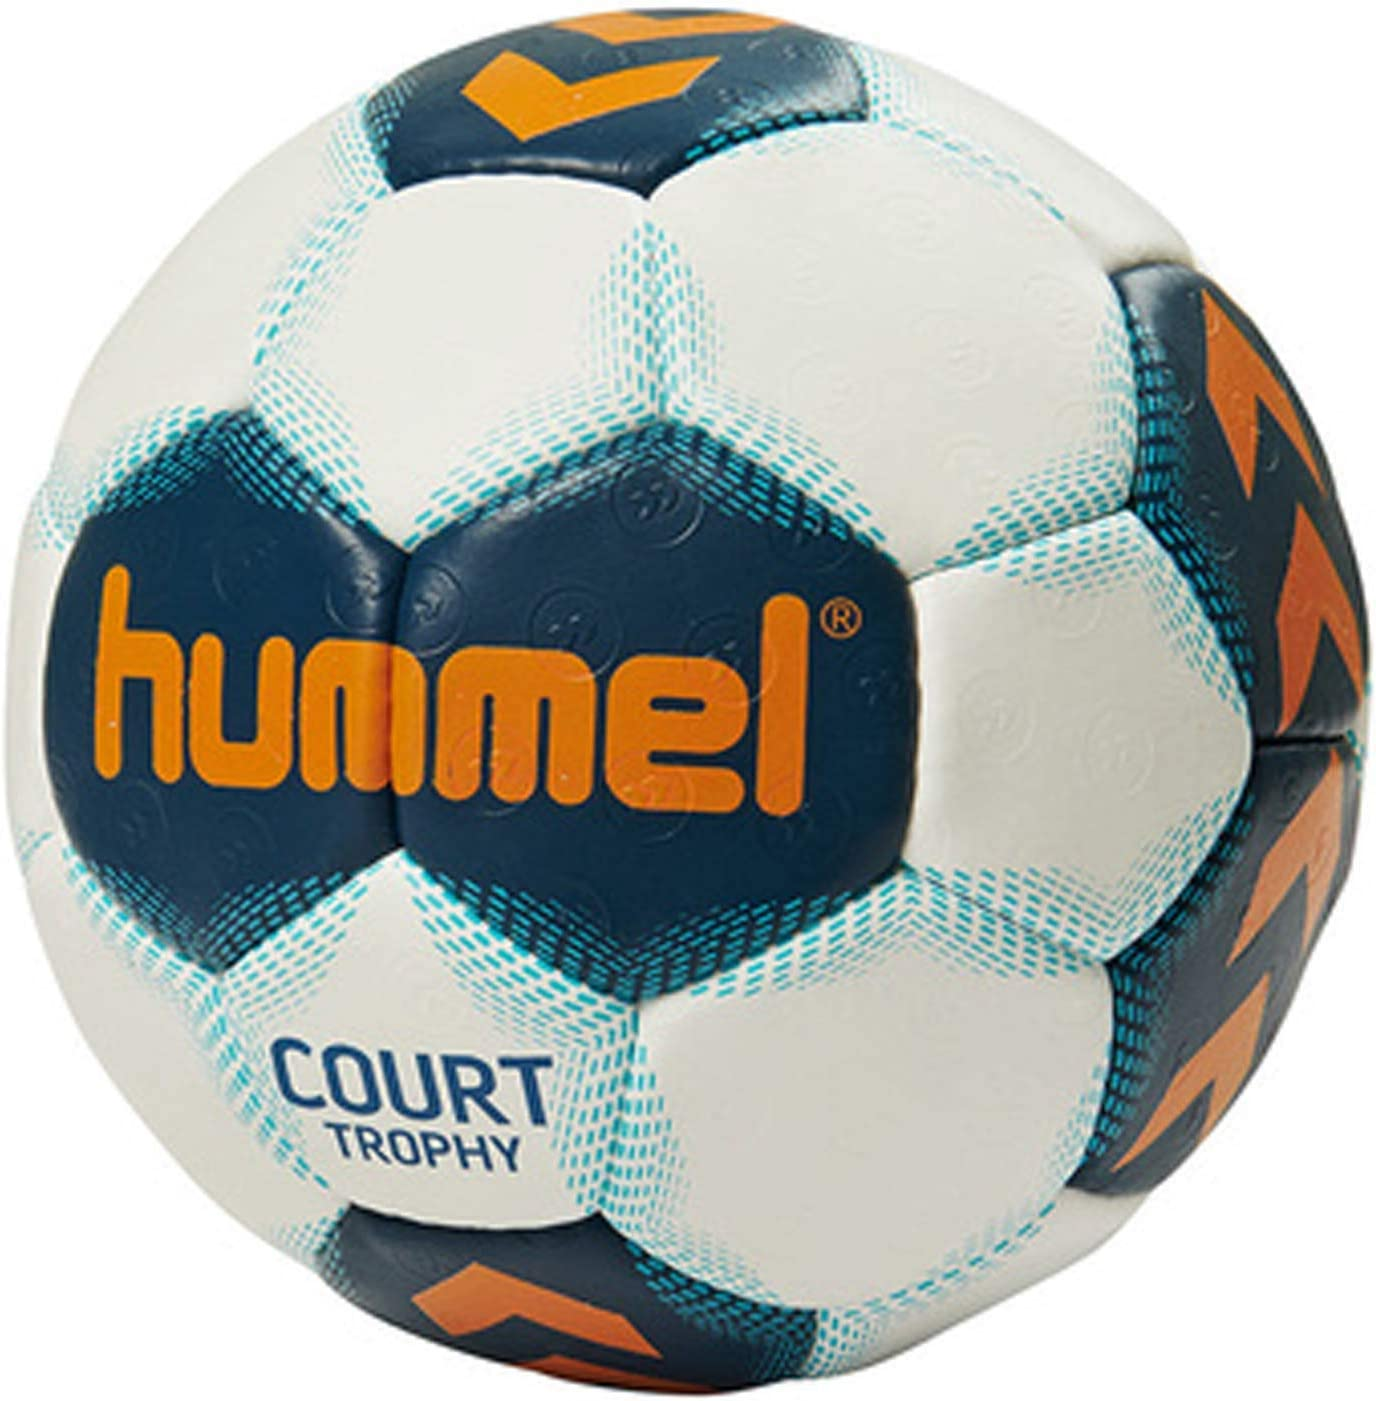 hummel Court Trophy de Balonmano, otoño/Invierno, Color White ...